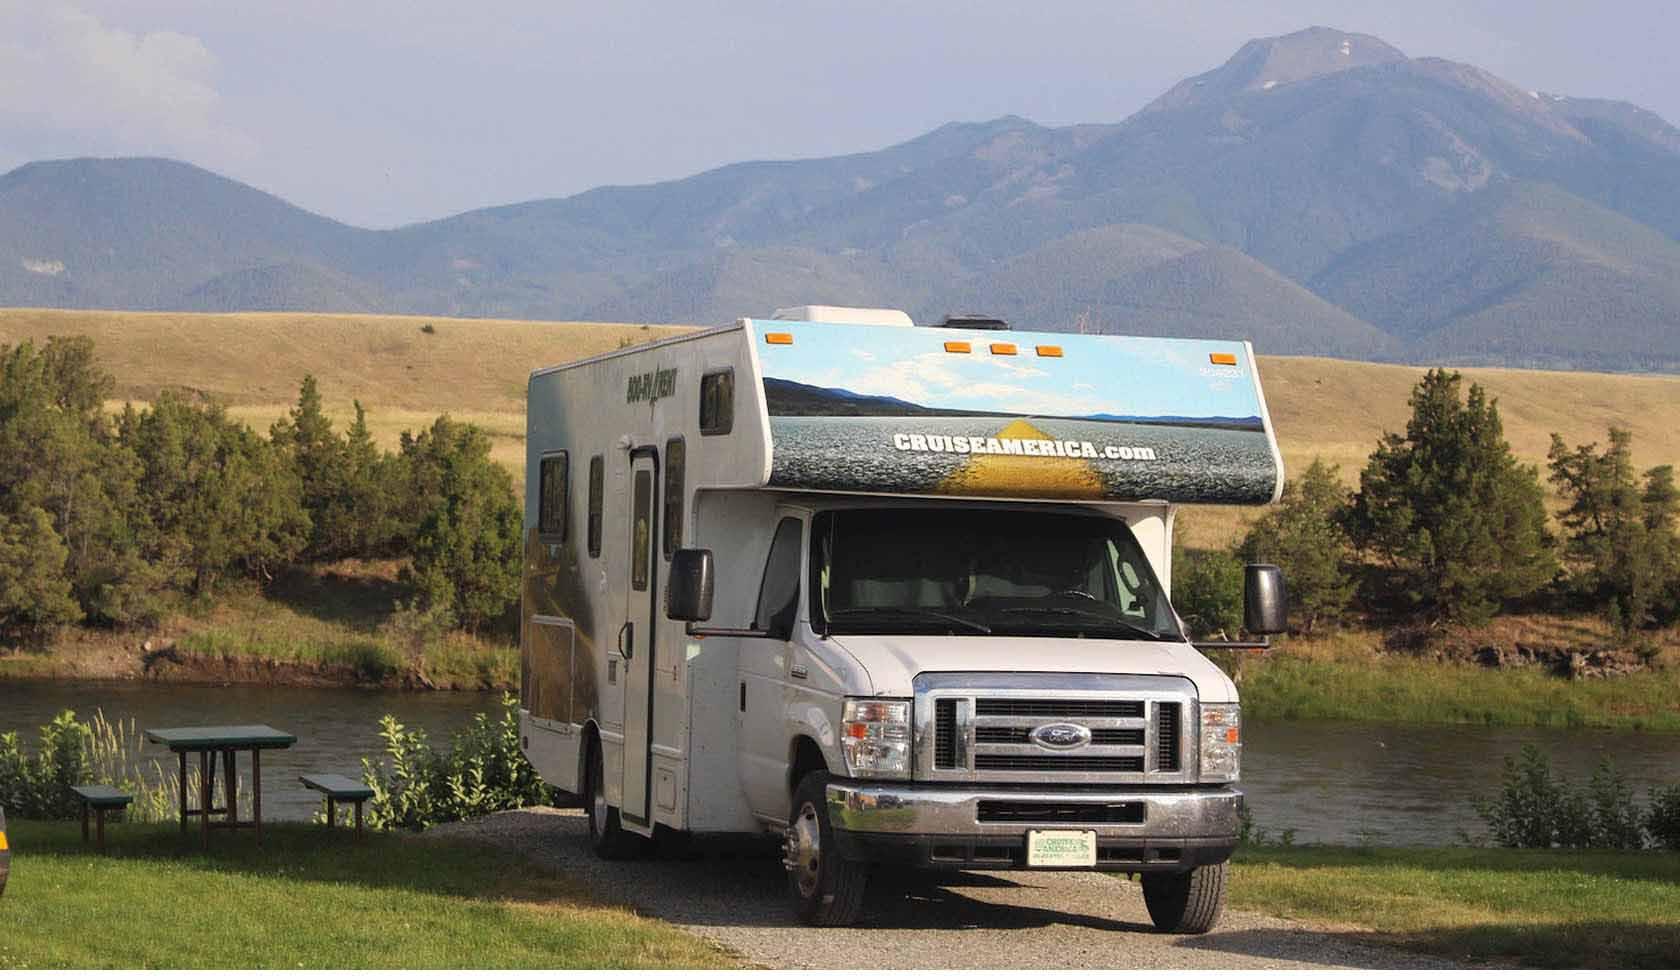 Yellowstone's Edge RV Park profile image